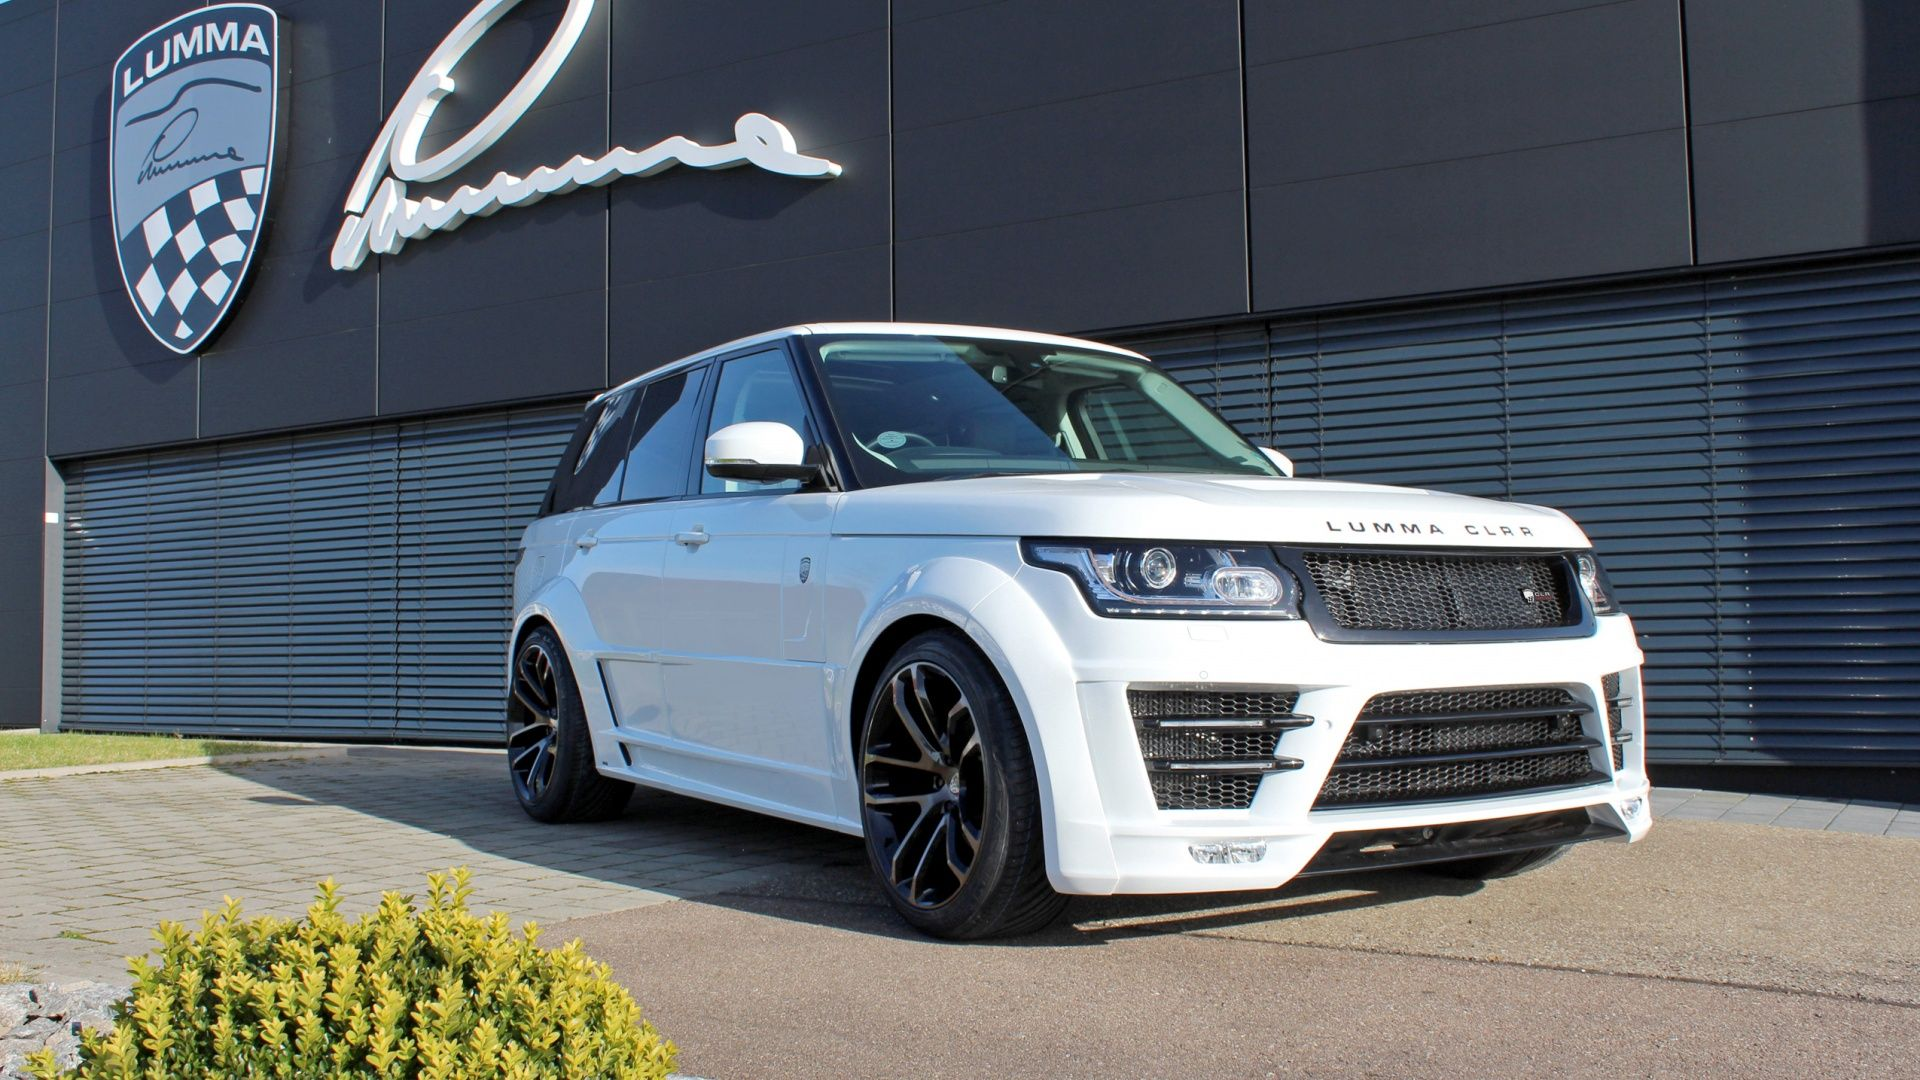 Baixar Wallpaper CLR R Lumma projeto рендж ровер de 2014 Range Rover L405 se§£o Land Rover resolu§£o